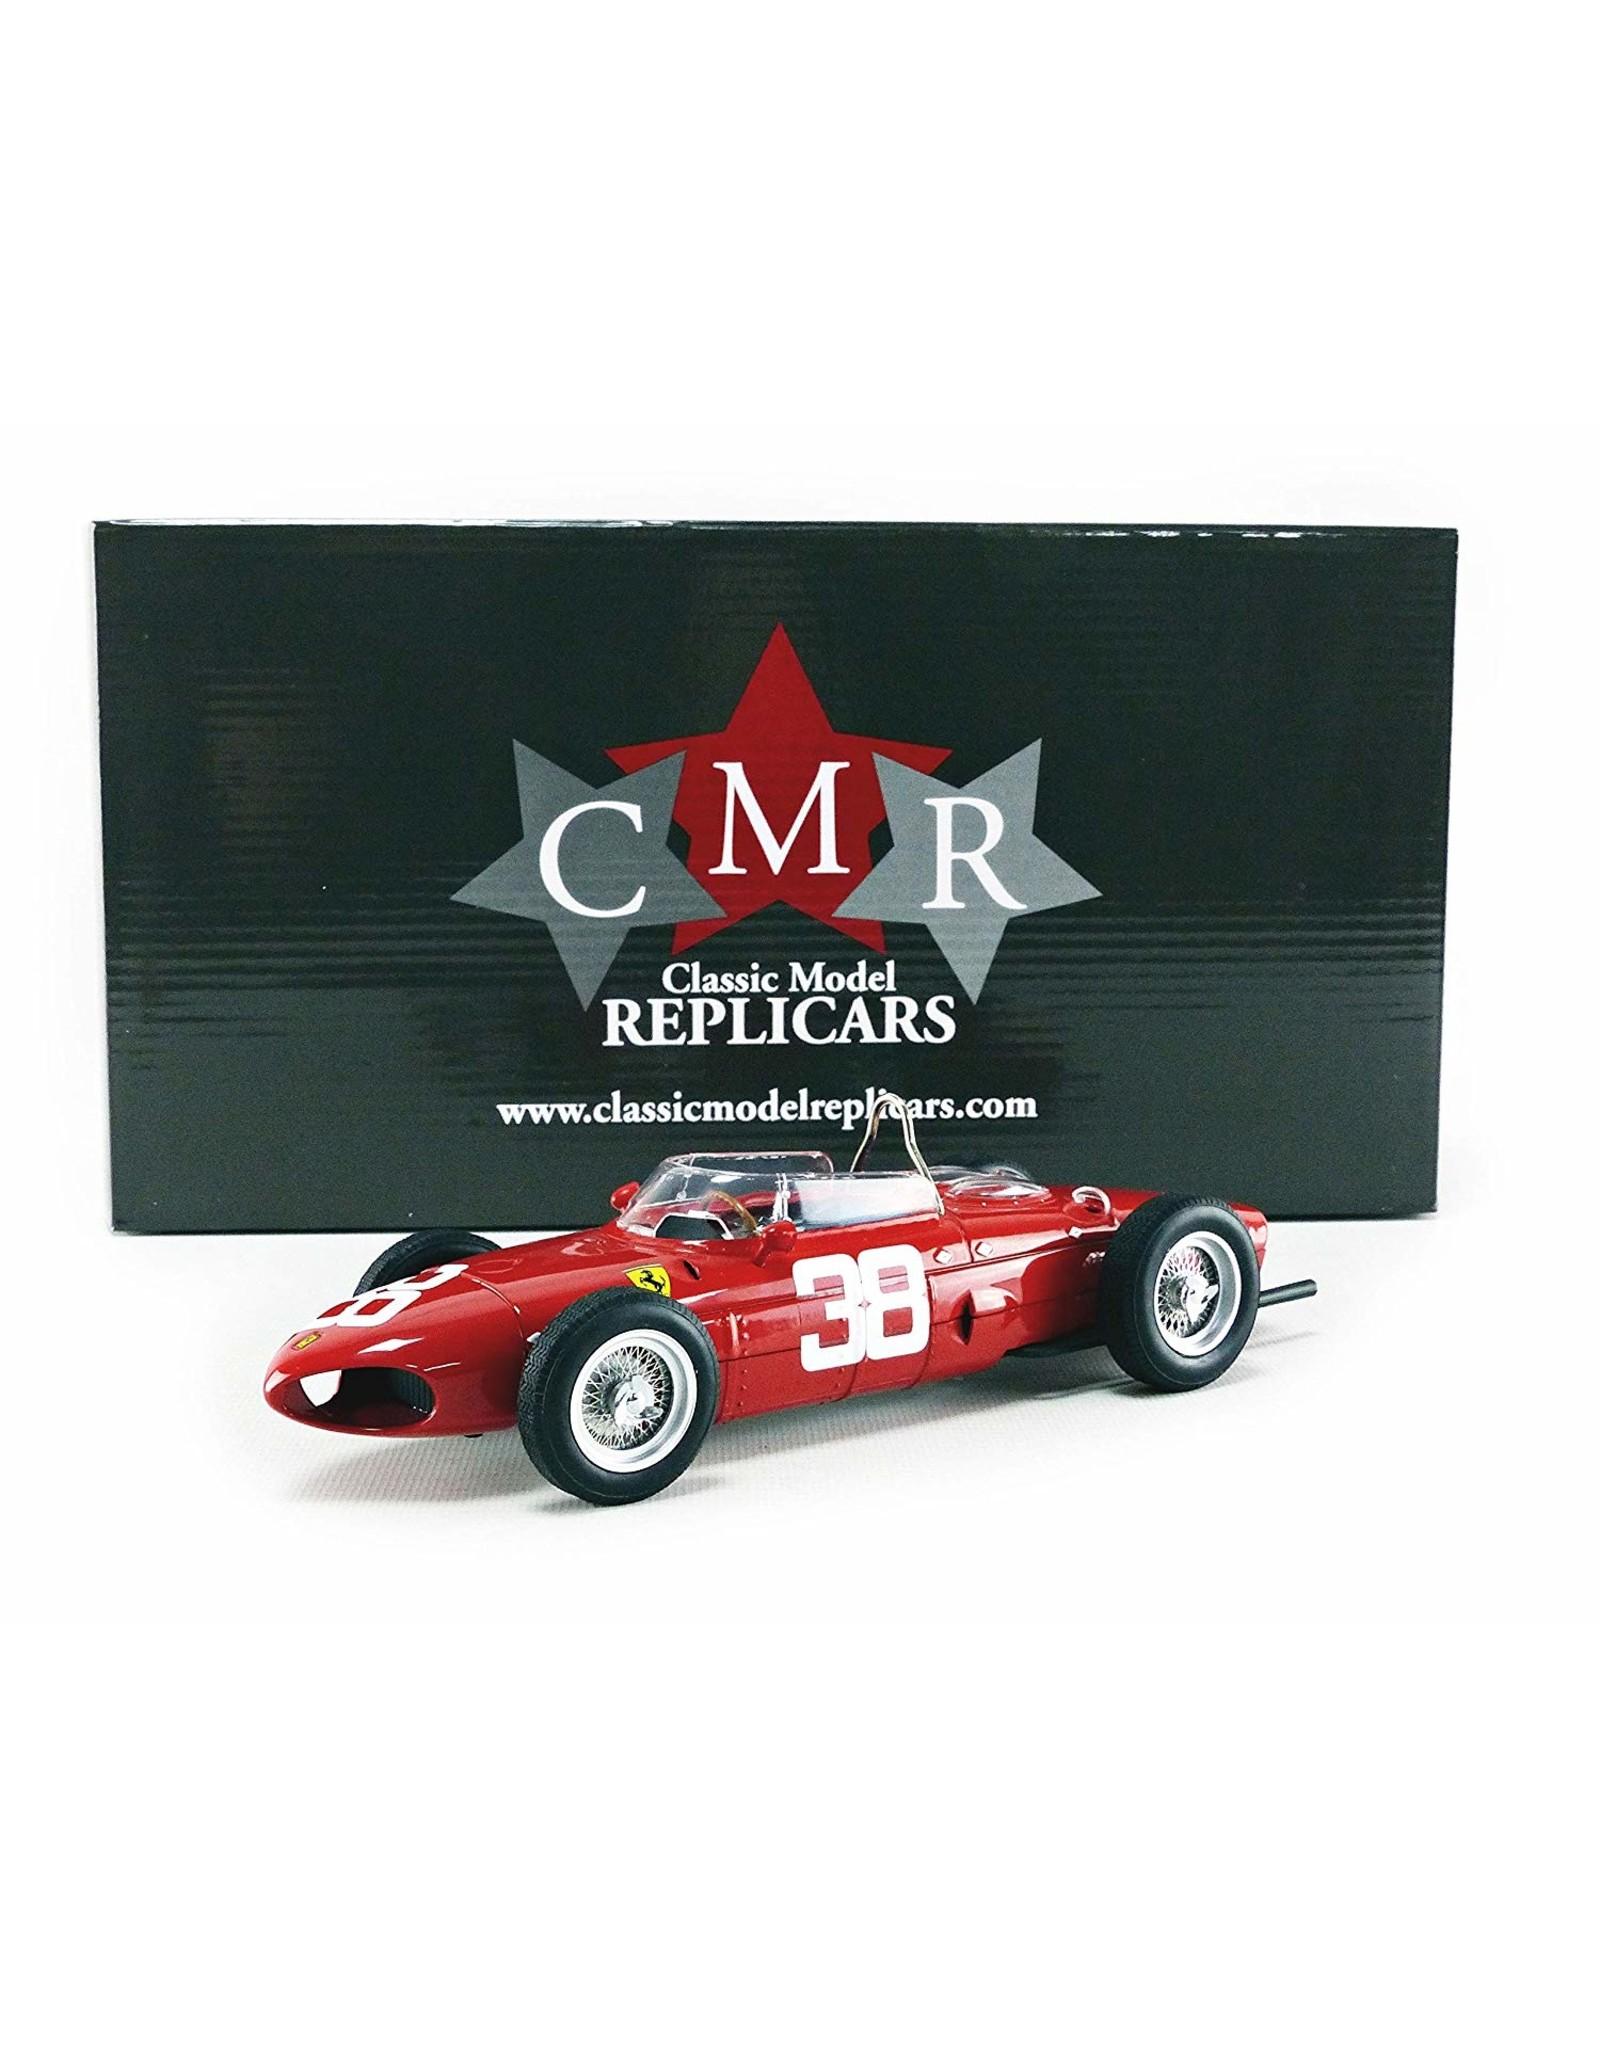 Formule 1 Ferrari Dino 156 Sharknose #38 3rd GP Monaco 1961 - 1:18 - CMR Classic Model Replicars